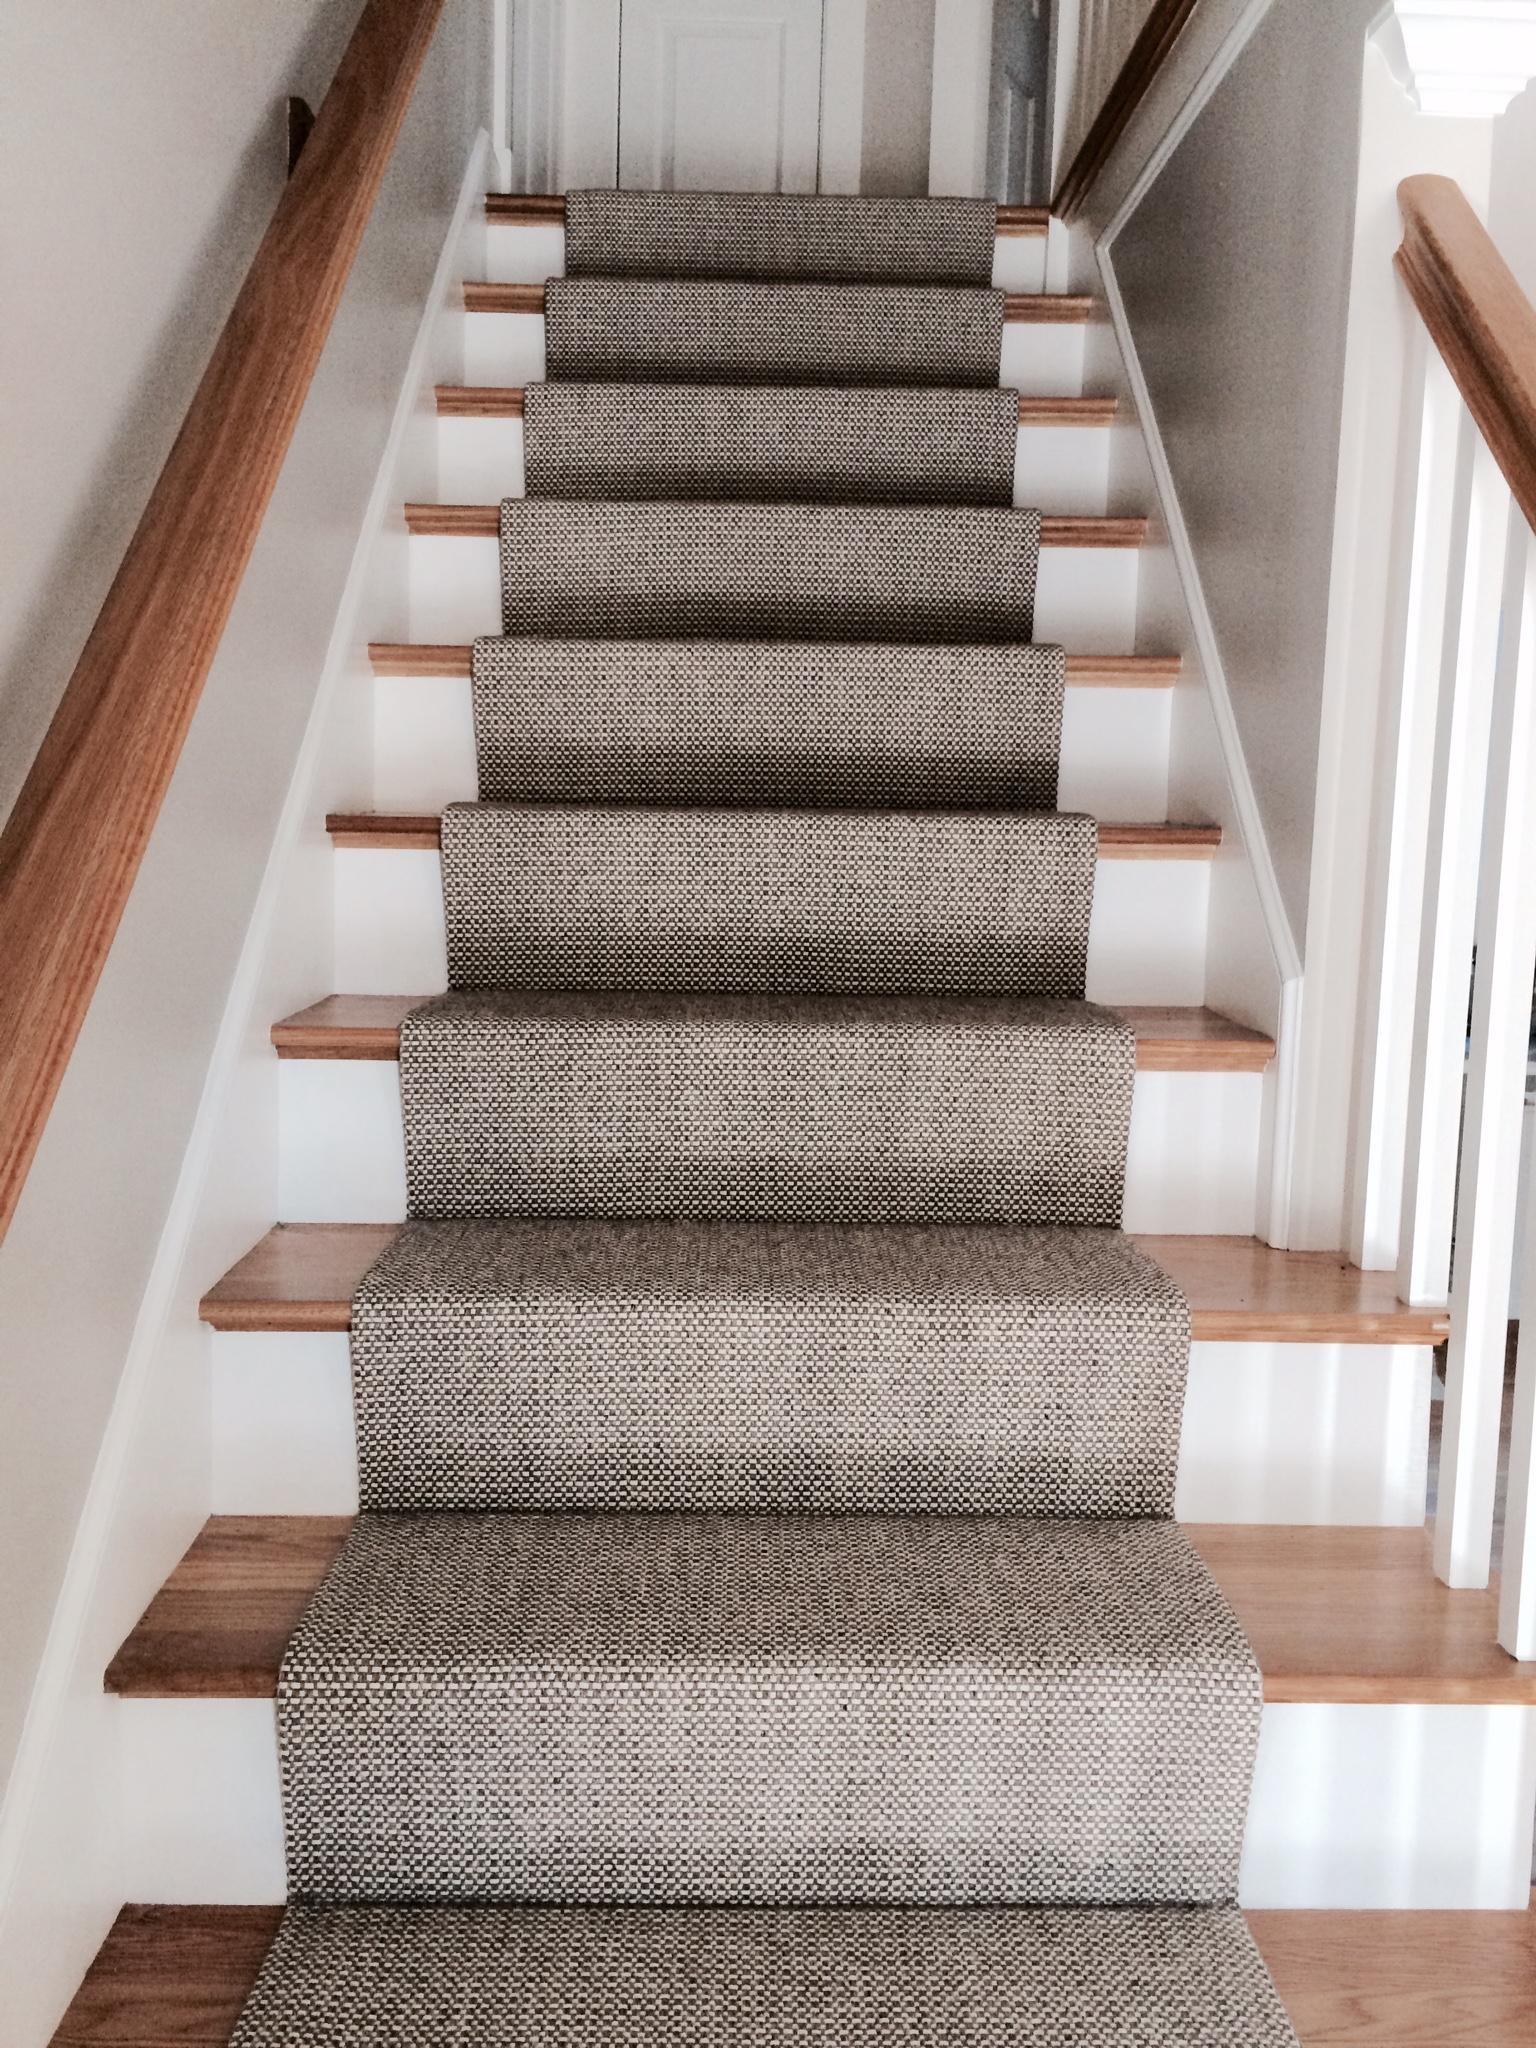 Popular Merida Flat Woven Wool Stair Runner By stair runner carpet